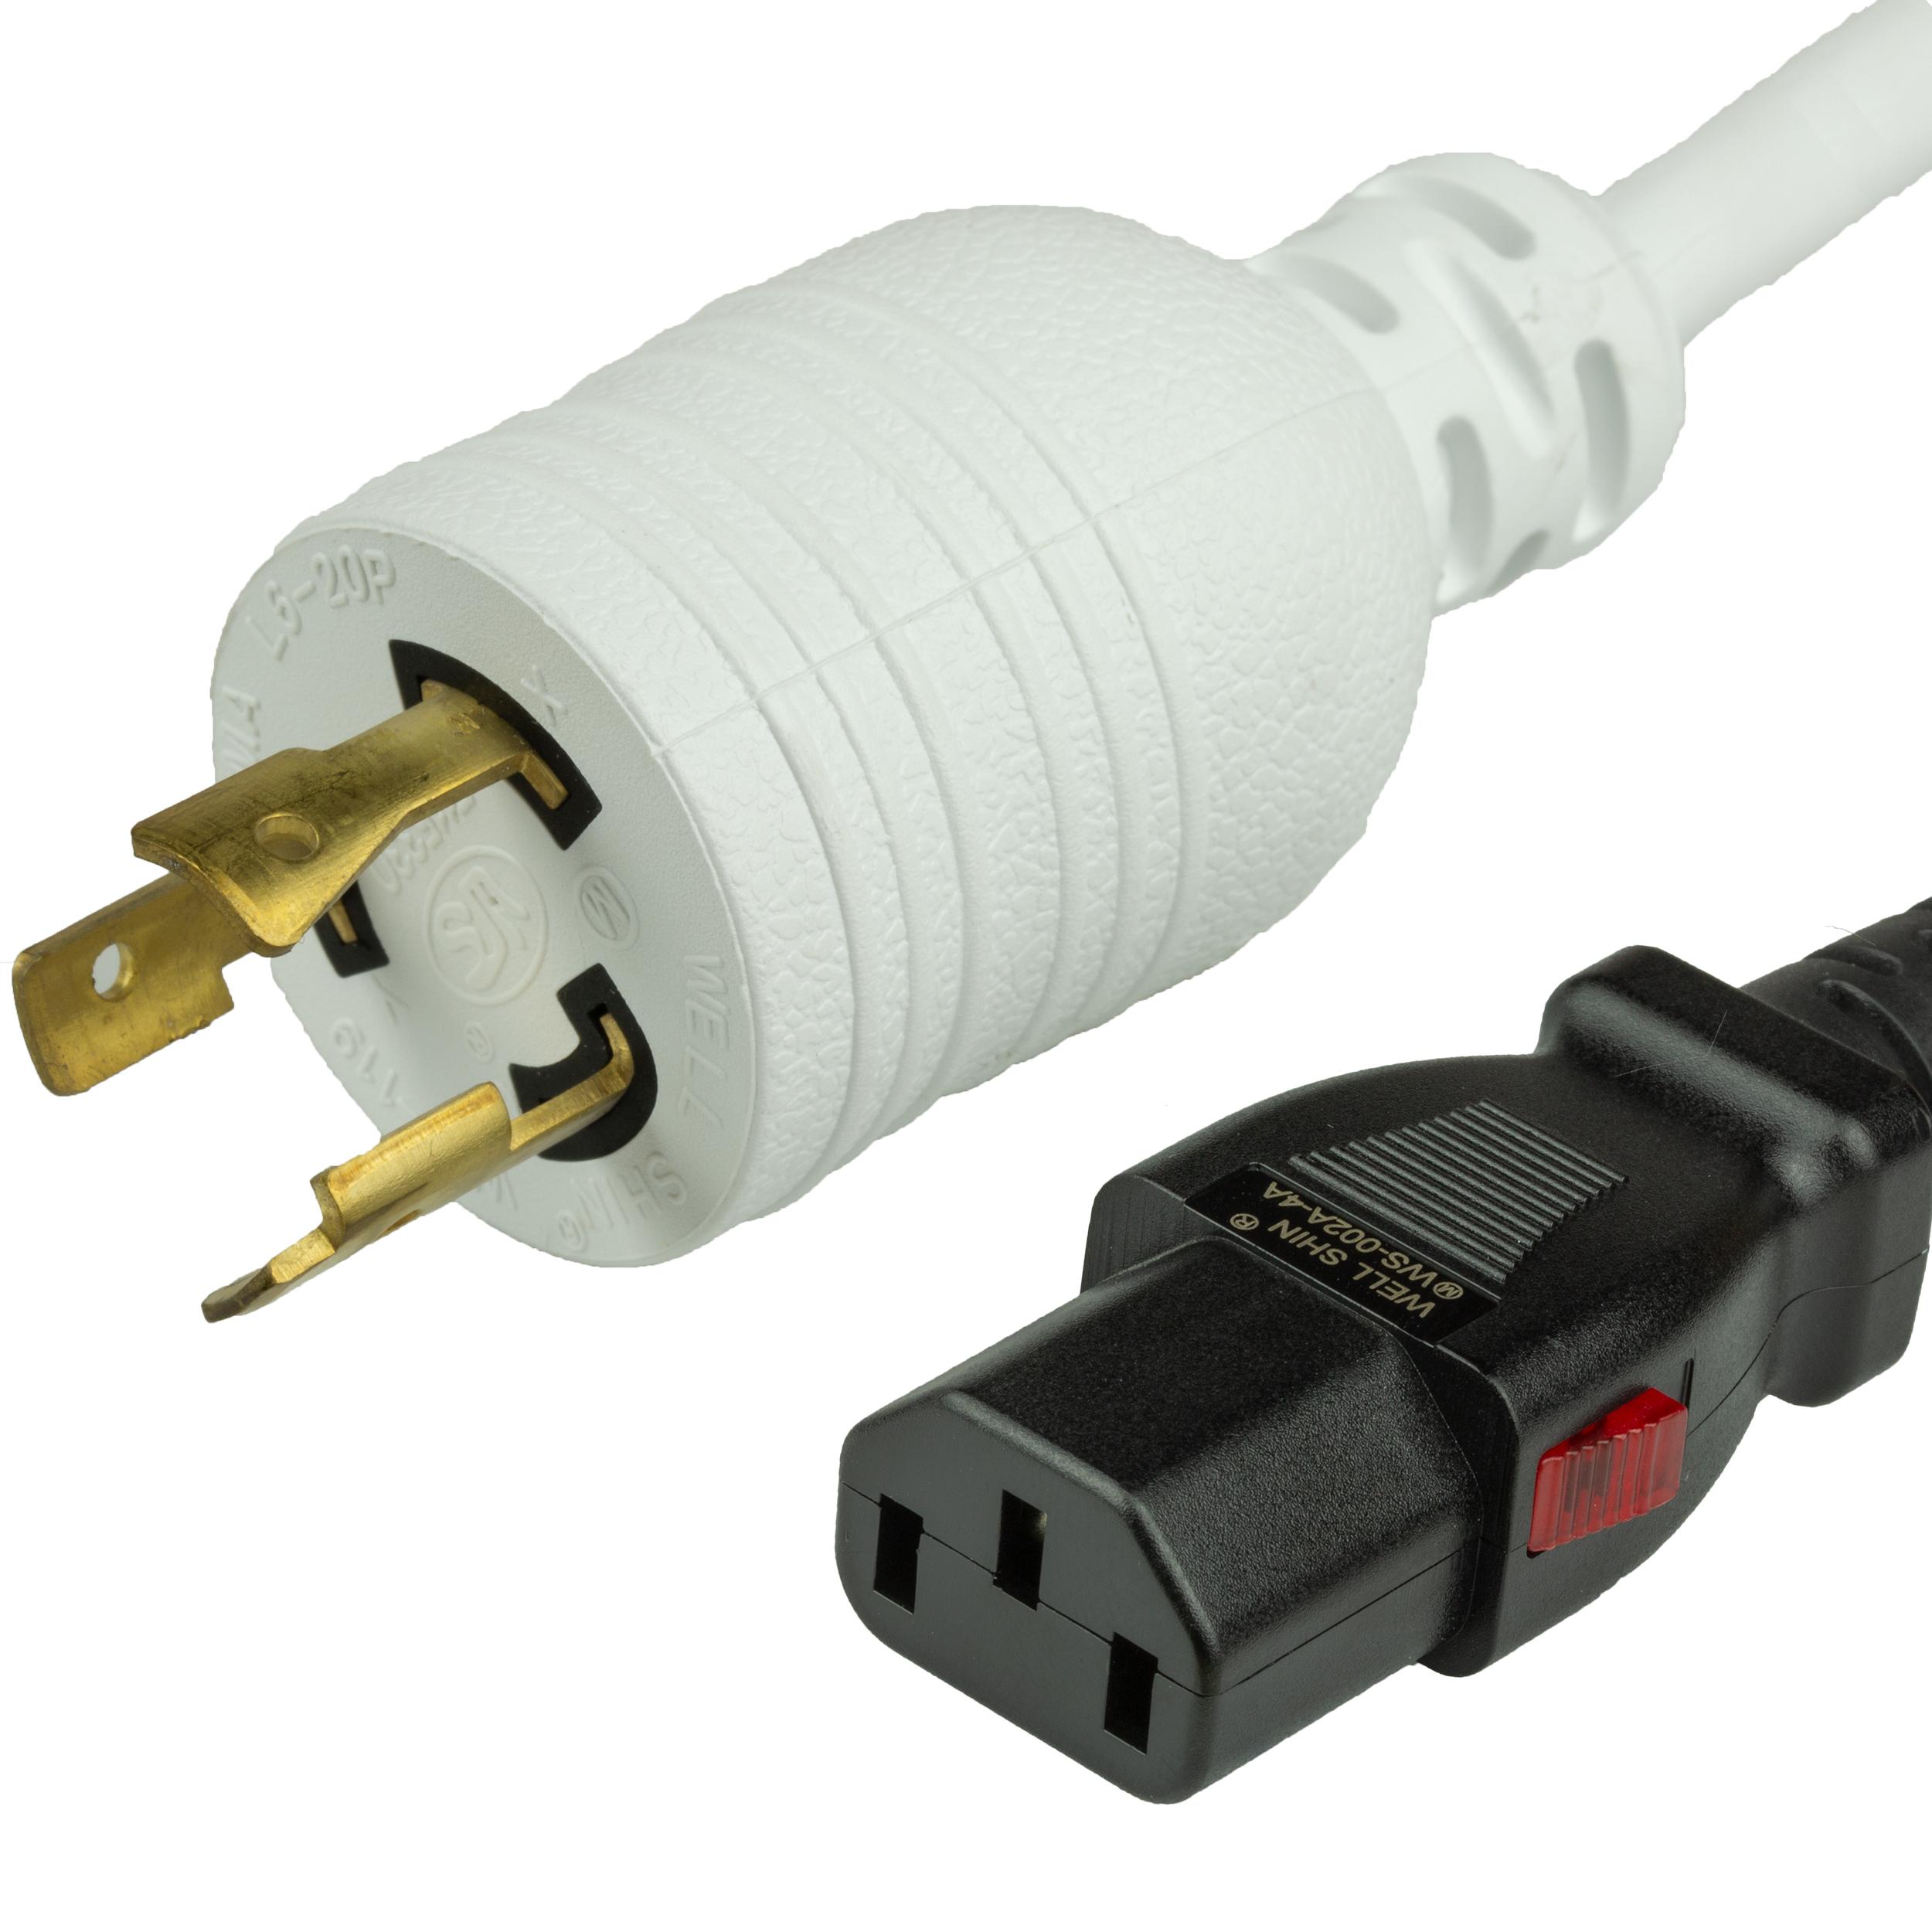 15A A-Lock C13 L6-20P Power Cords - WHITE